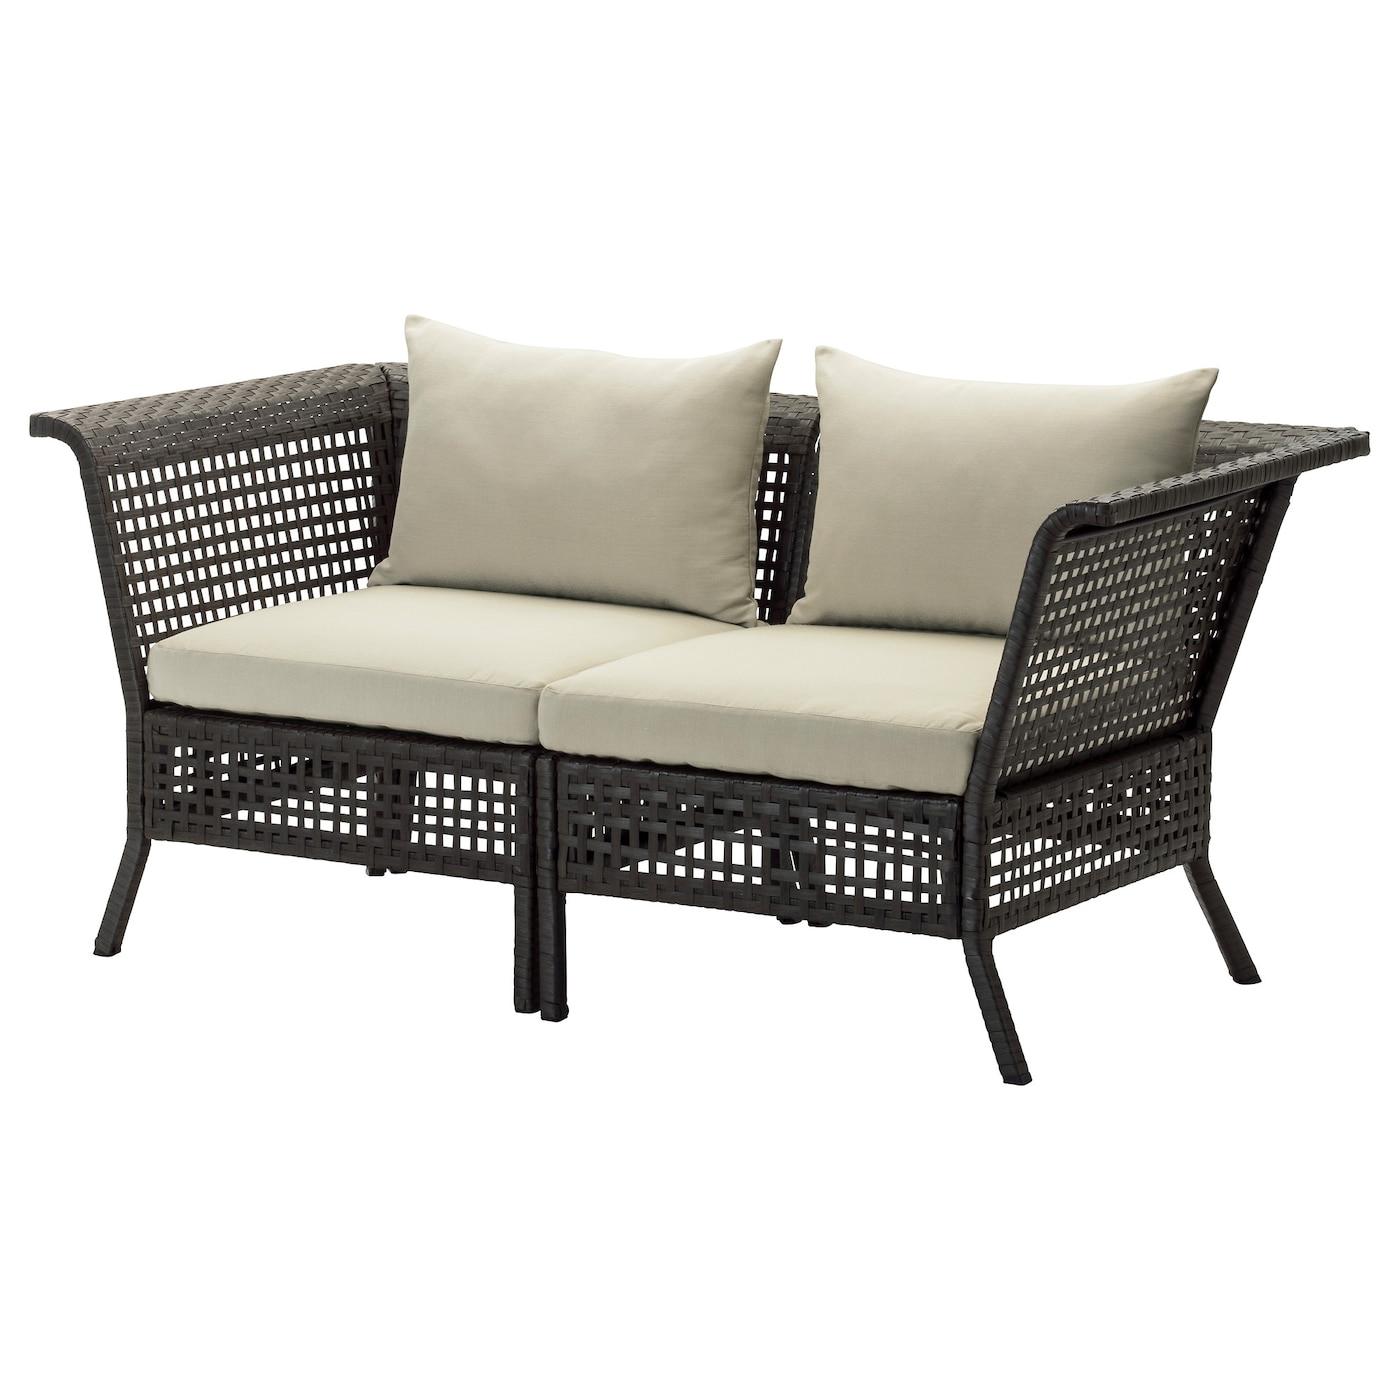 Ikea Kungsholmen 2 Seat Modular Sofa Outdoor